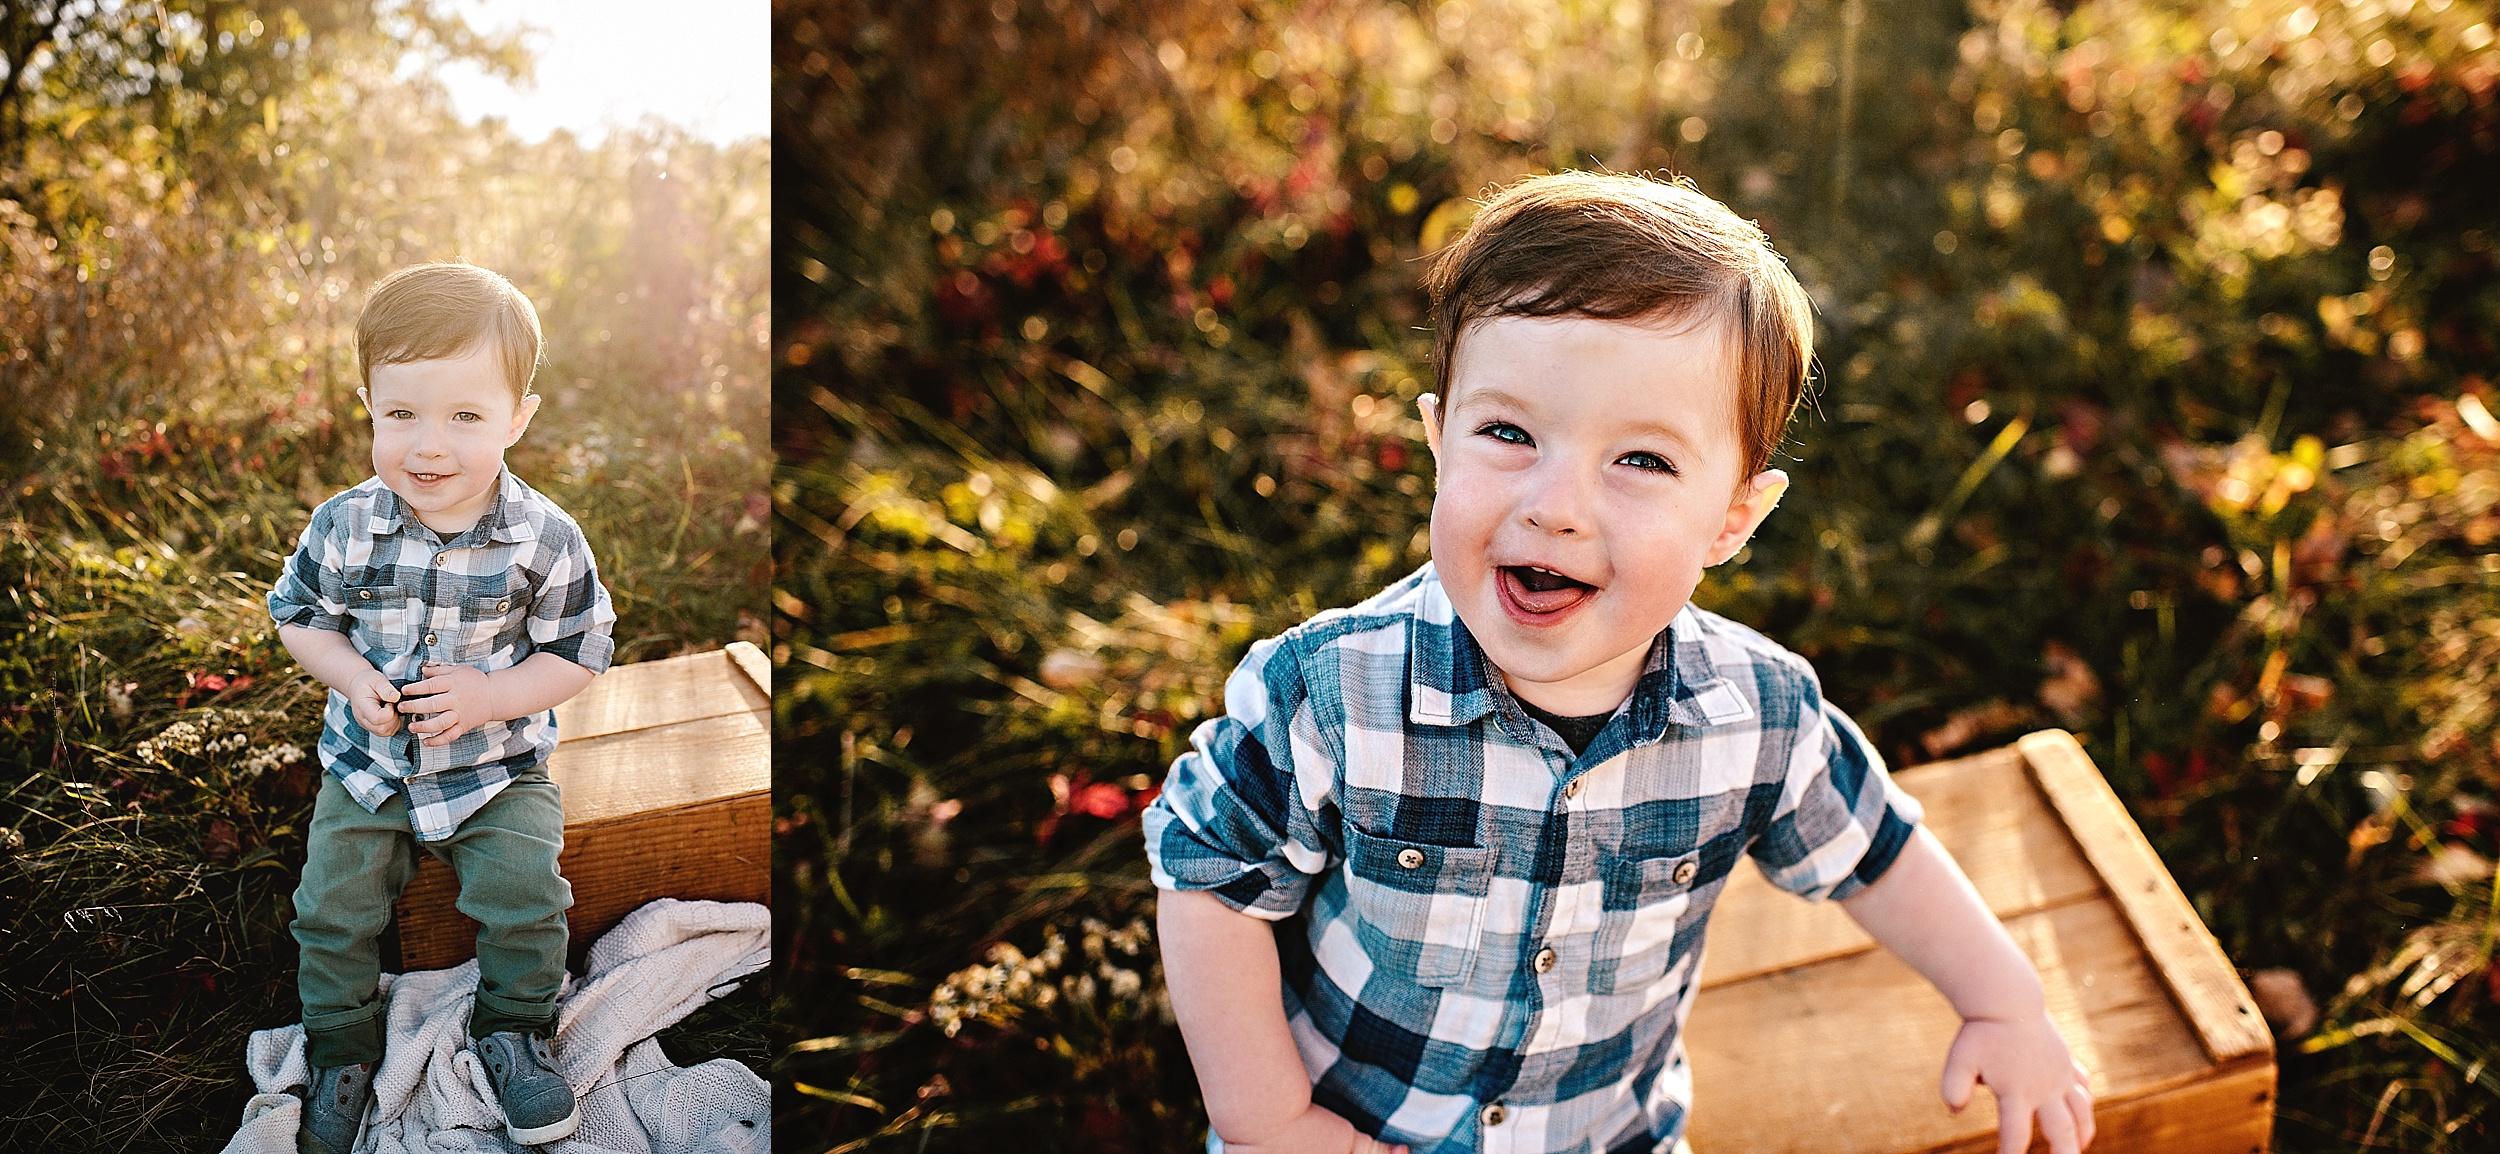 lauren-grayson-photography-portrait-artist-akron-cleveland-ohio-photographer-family-session-fields-sunset-fall_0172.jpg